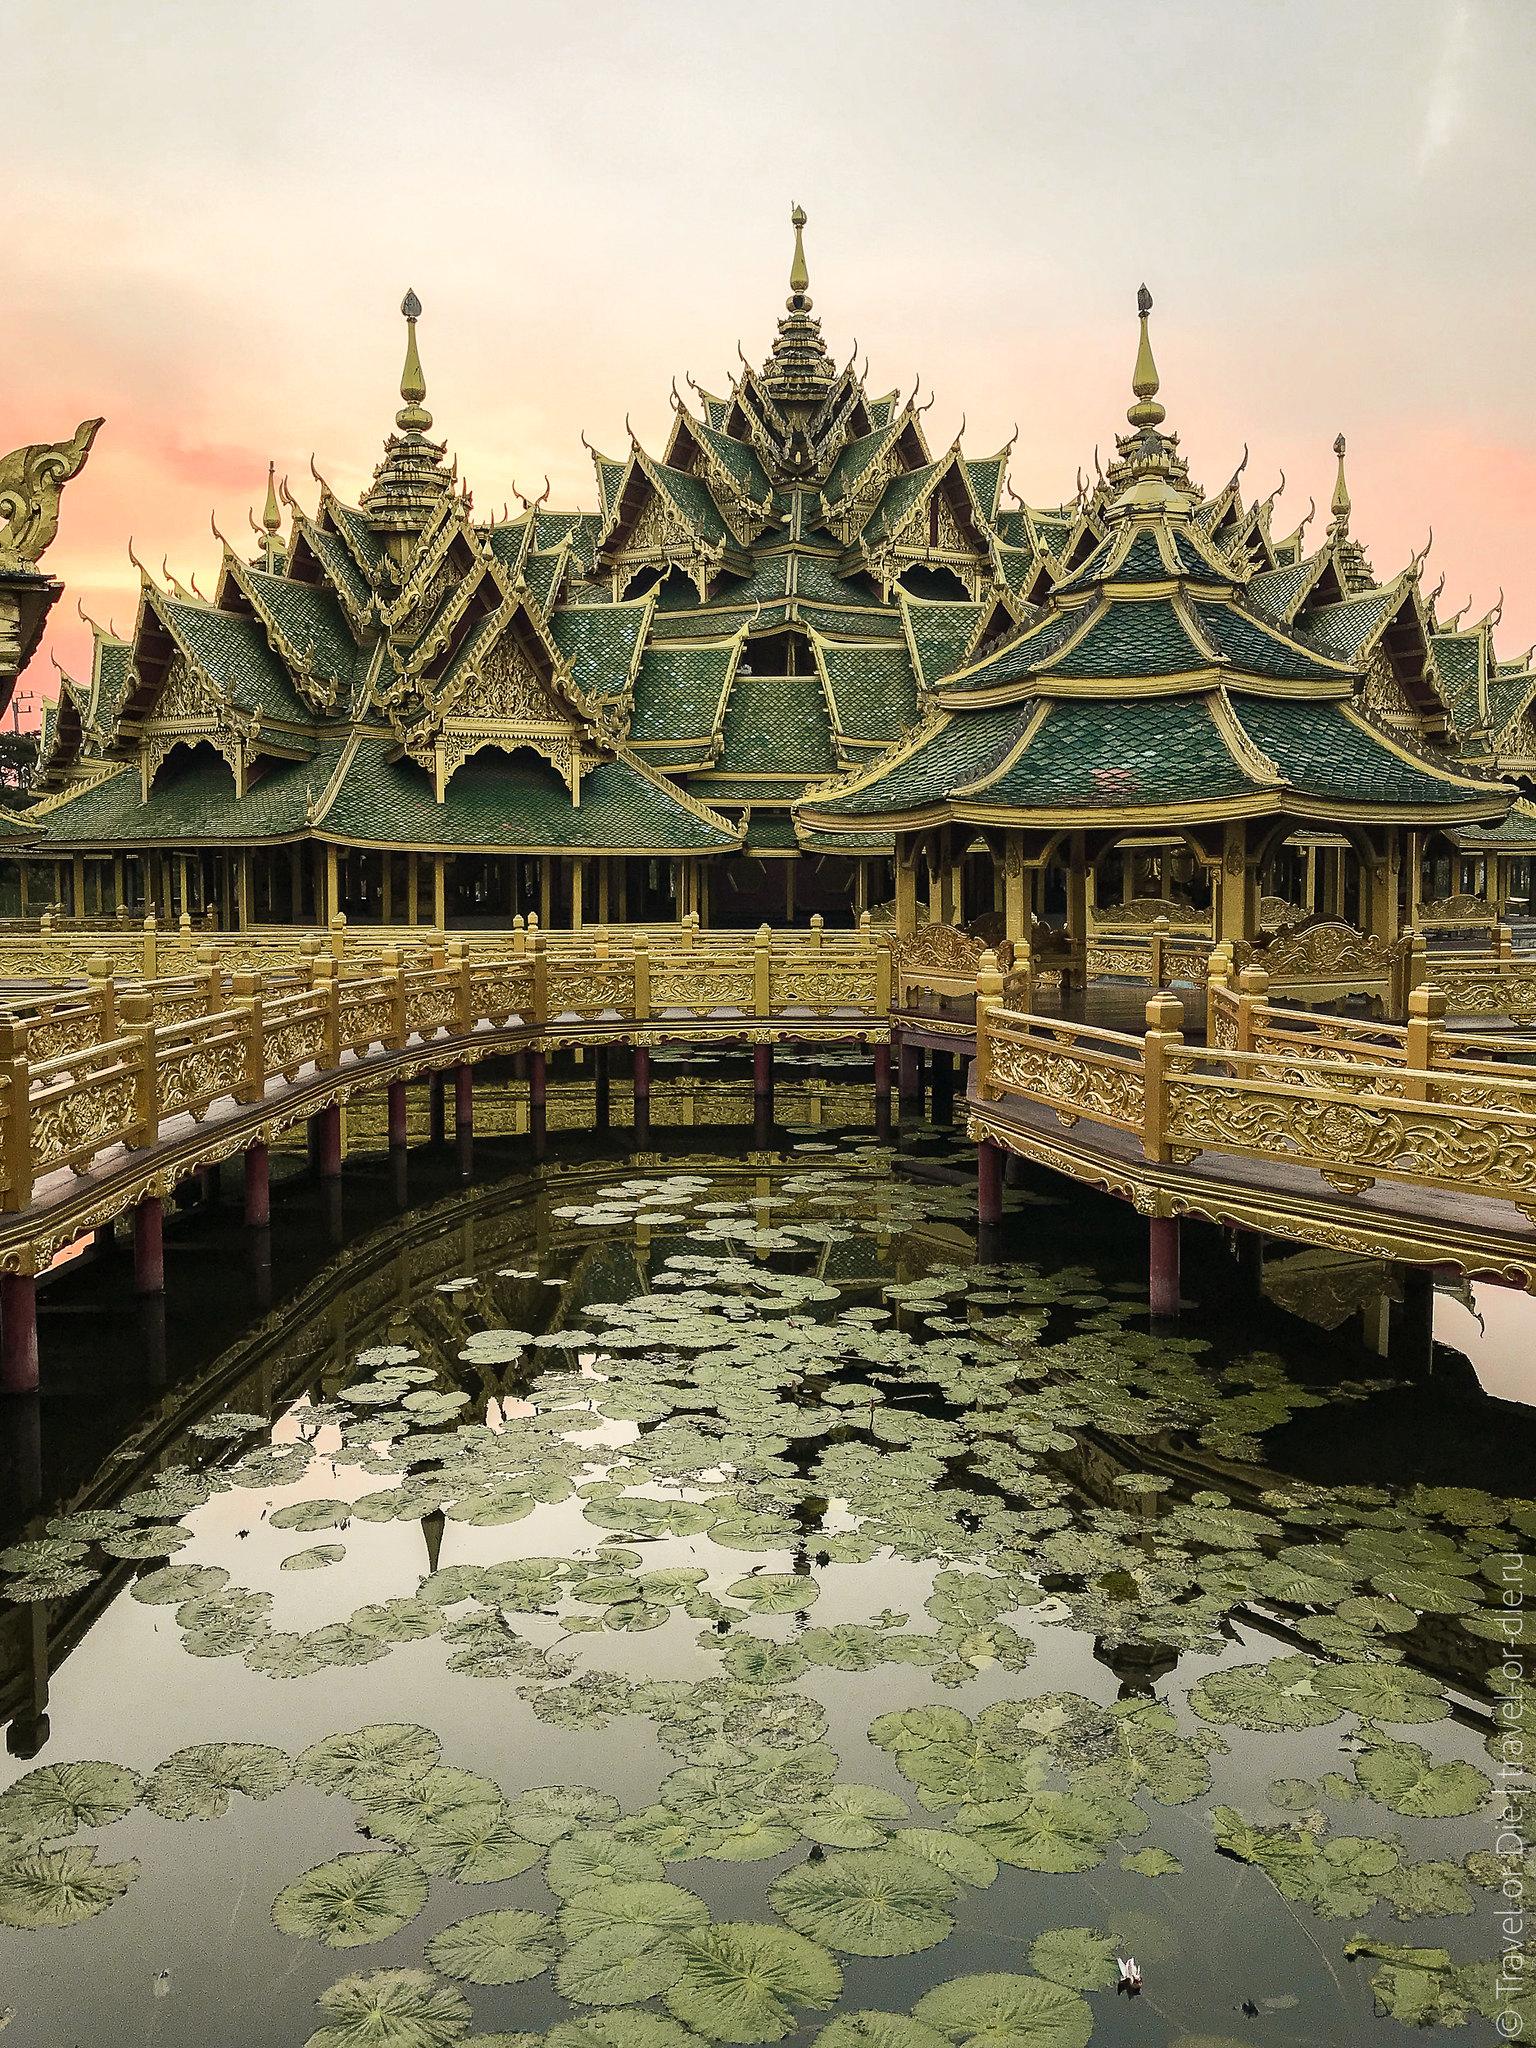 Ancient-City-Muang-Boran-Bangkok-9895